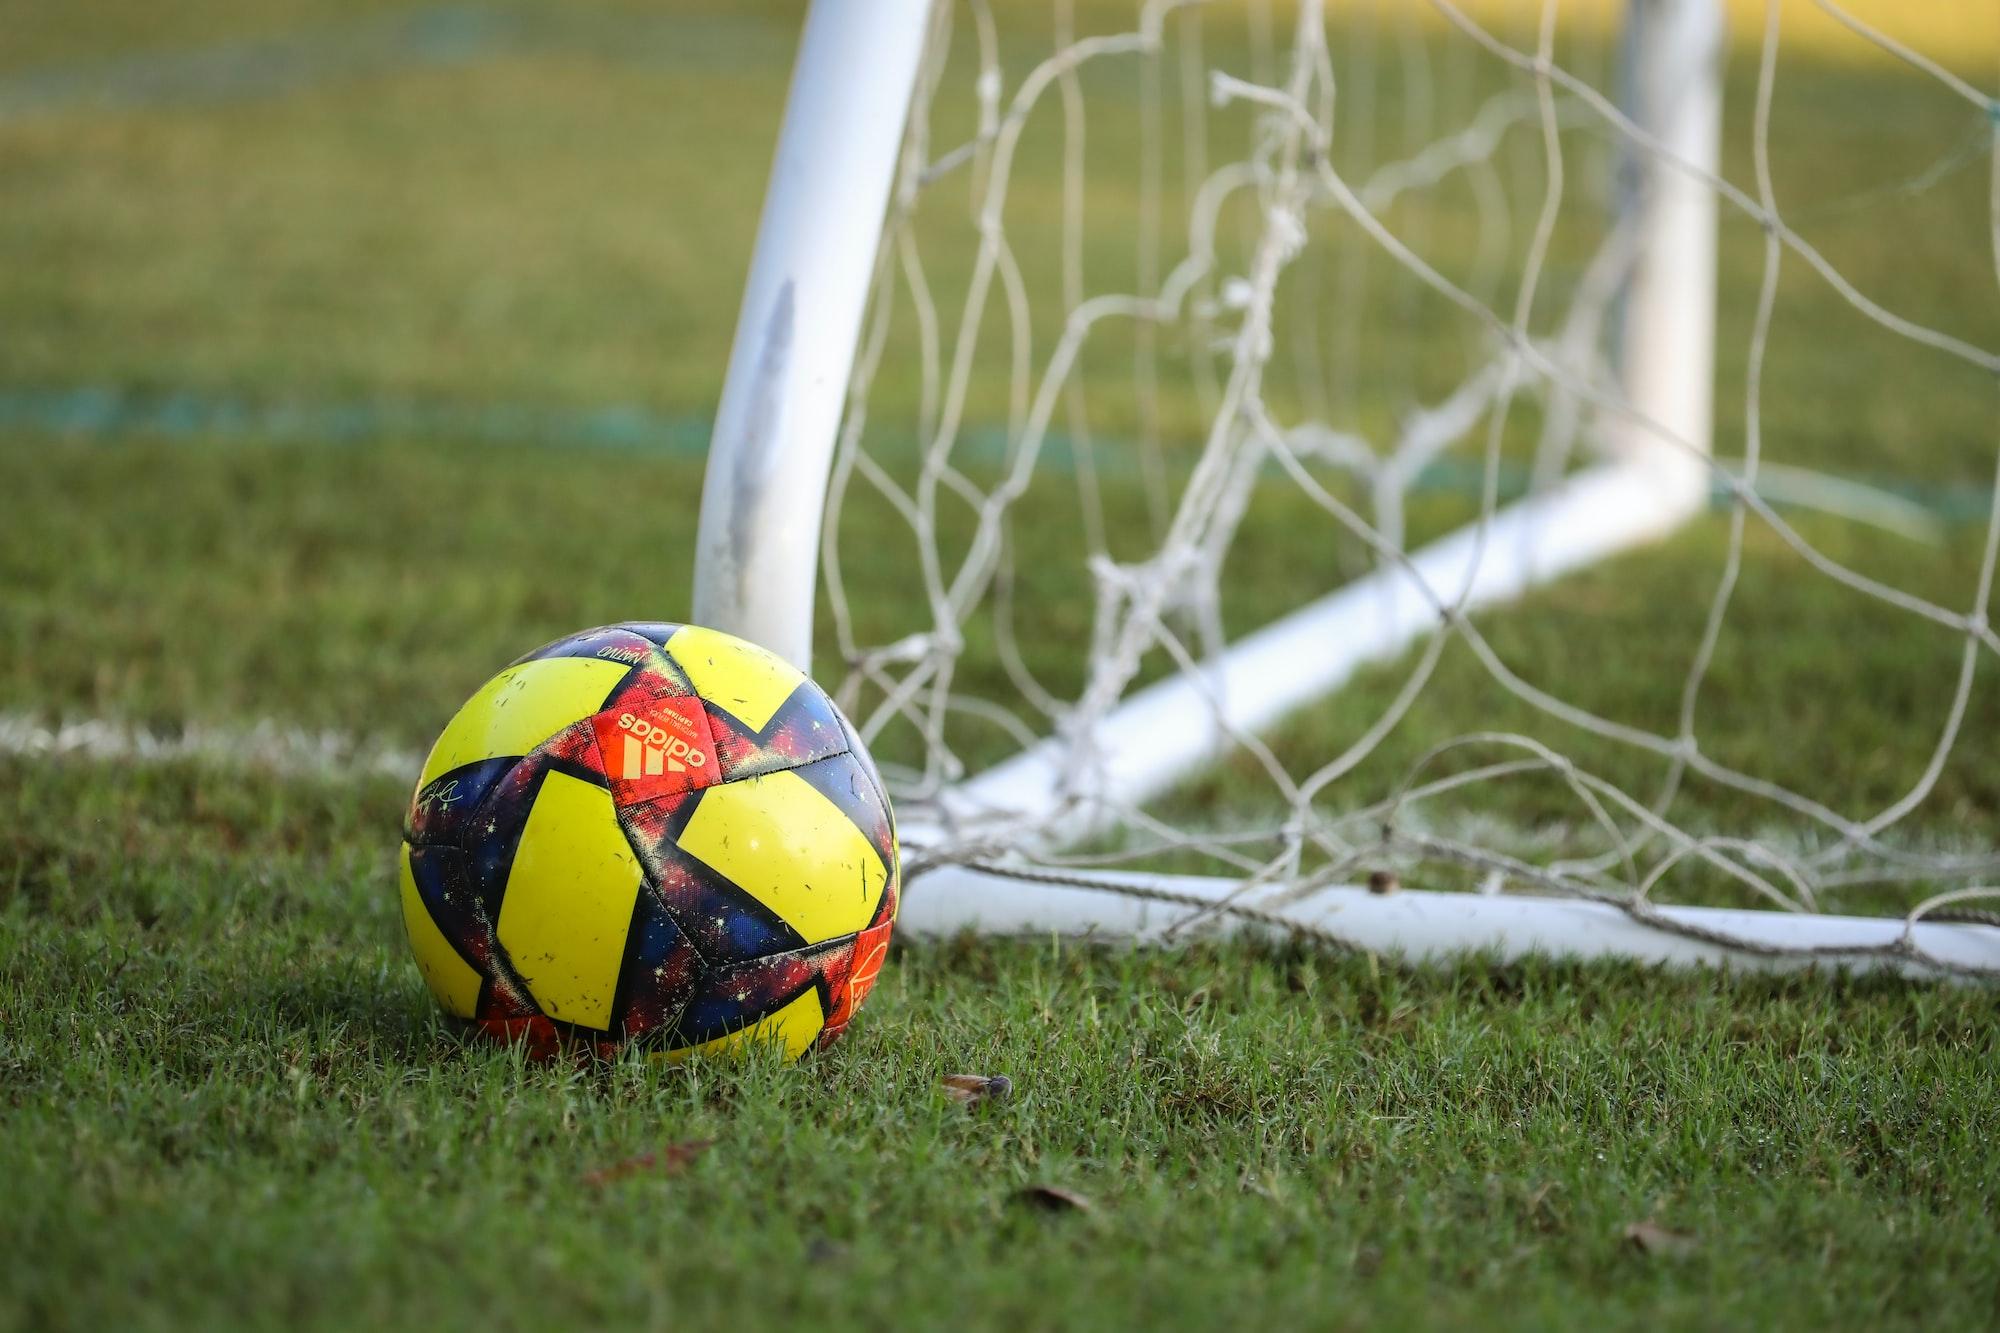 Pronostici di oggi: schedina calcio mista - 21/01/2021